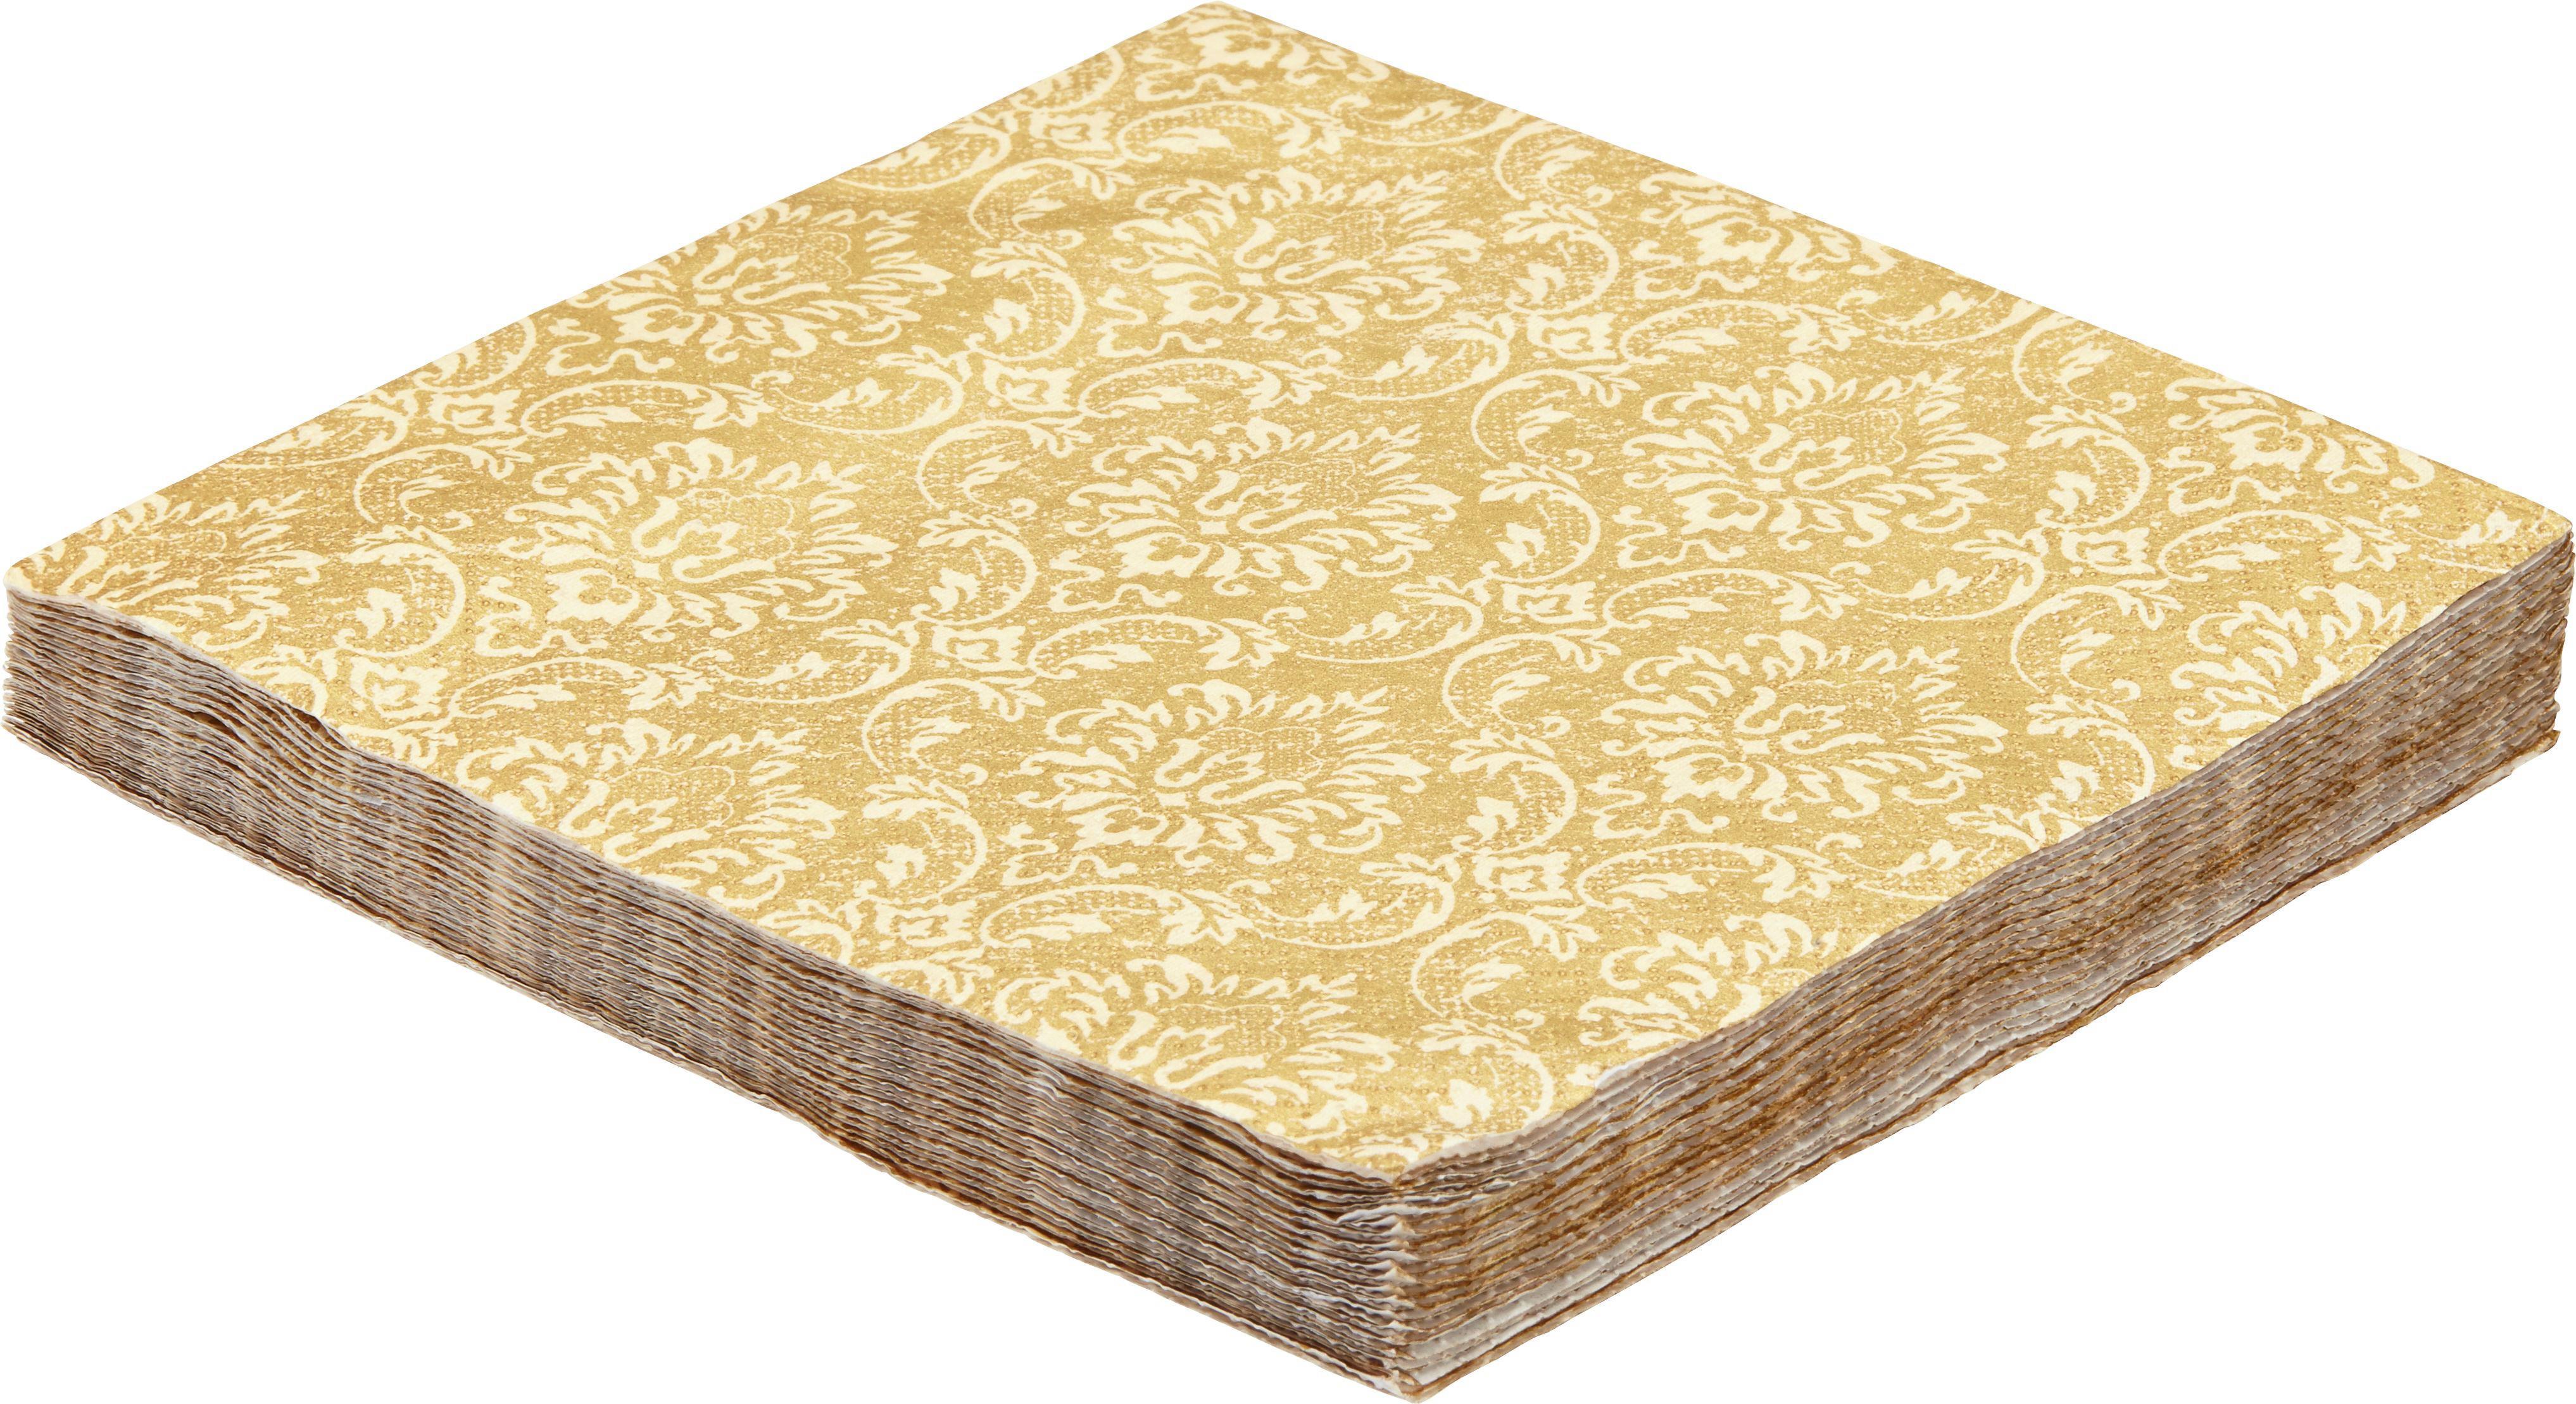 Serviette Patty aus Papier in Goldfarben - Goldfarben/Creme, LIFESTYLE, Papier (16,5/16,5/2,5cm) - MÖMAX modern living